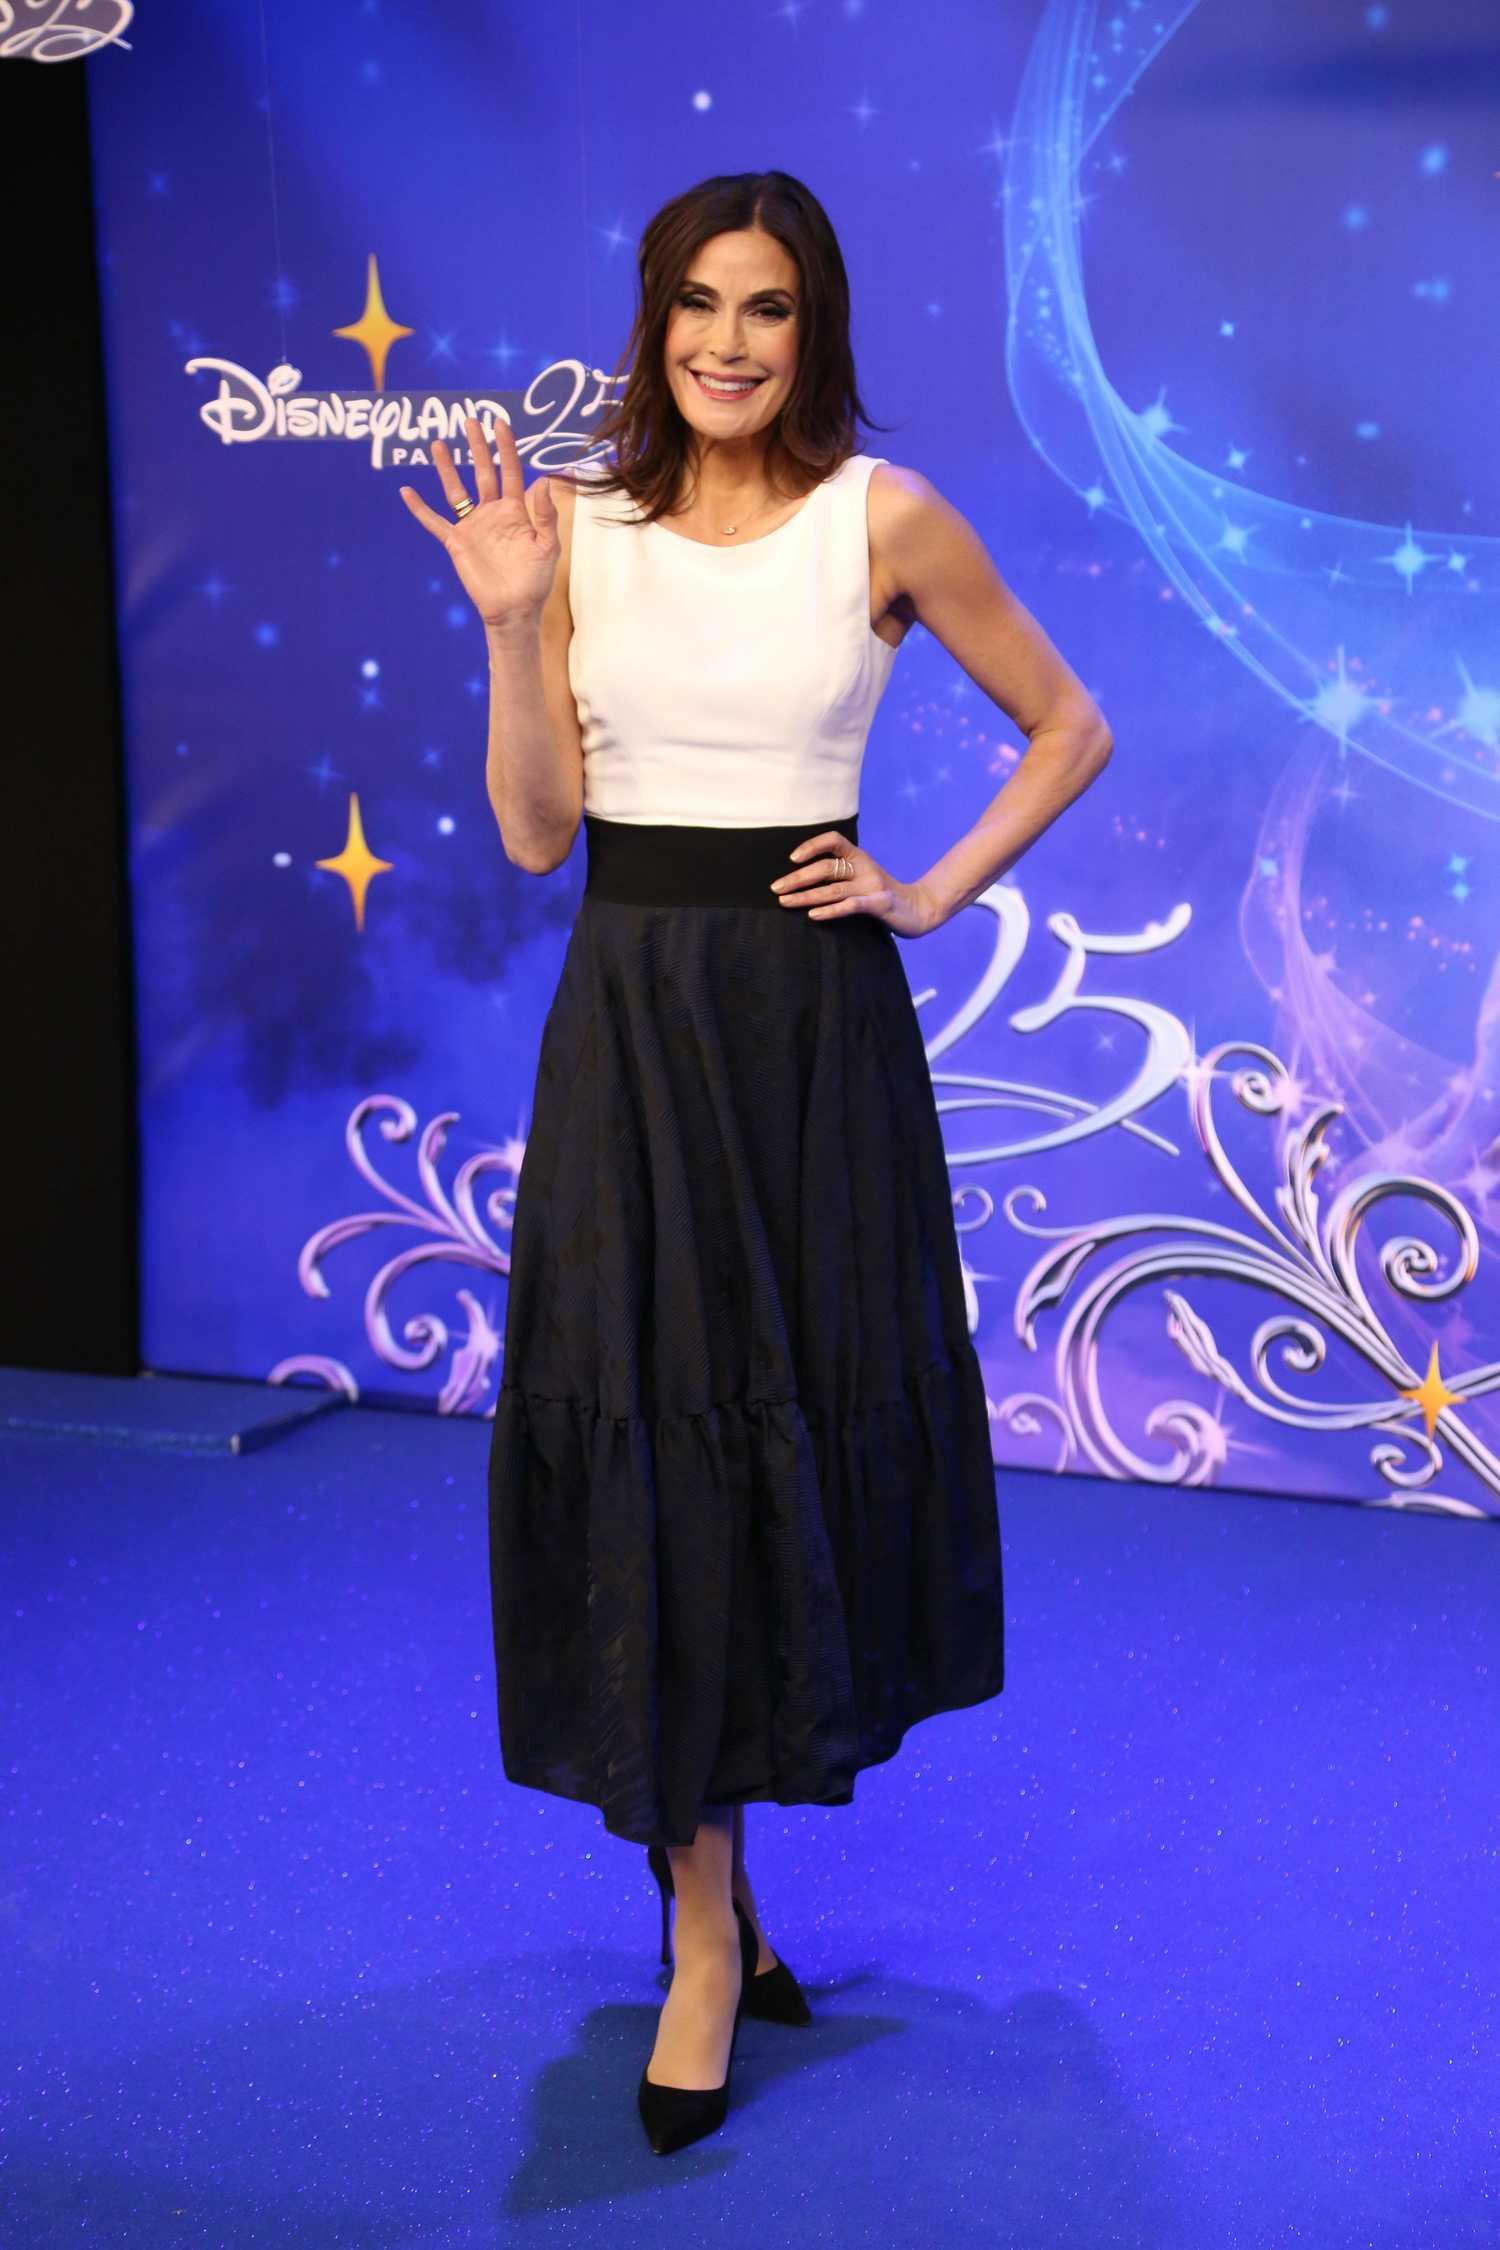 Teri Hatcher At The Disneyland Paris 25th Anniversary